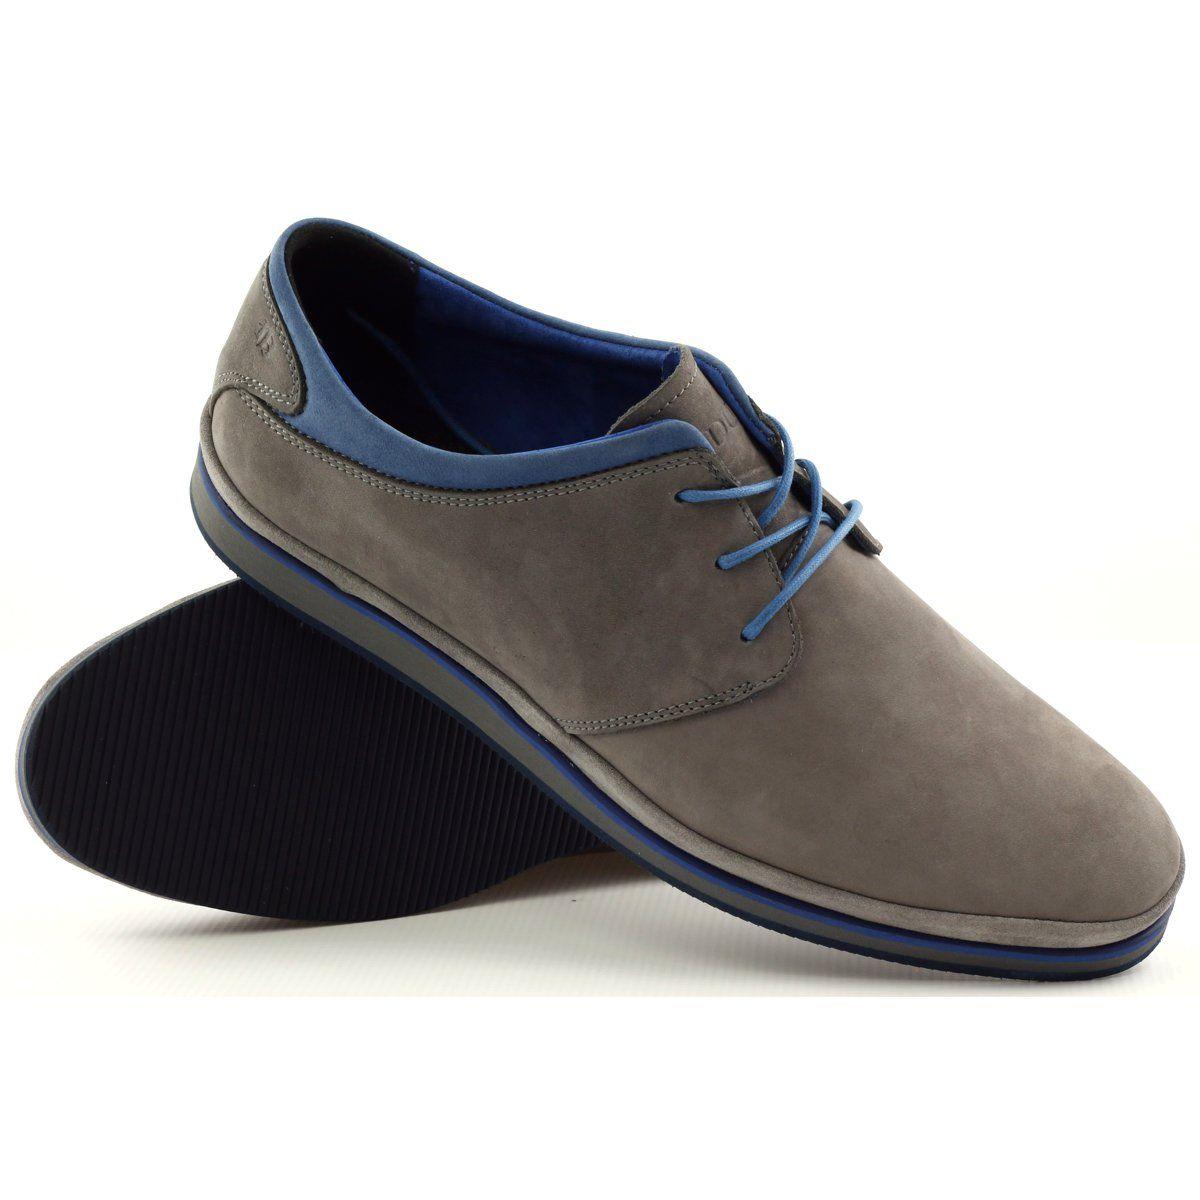 Polbuty Meskie Sportowe Badura 3363 Niebieskie Szare Gents Shoes Dress Shoes Men Mens Casual Shoes